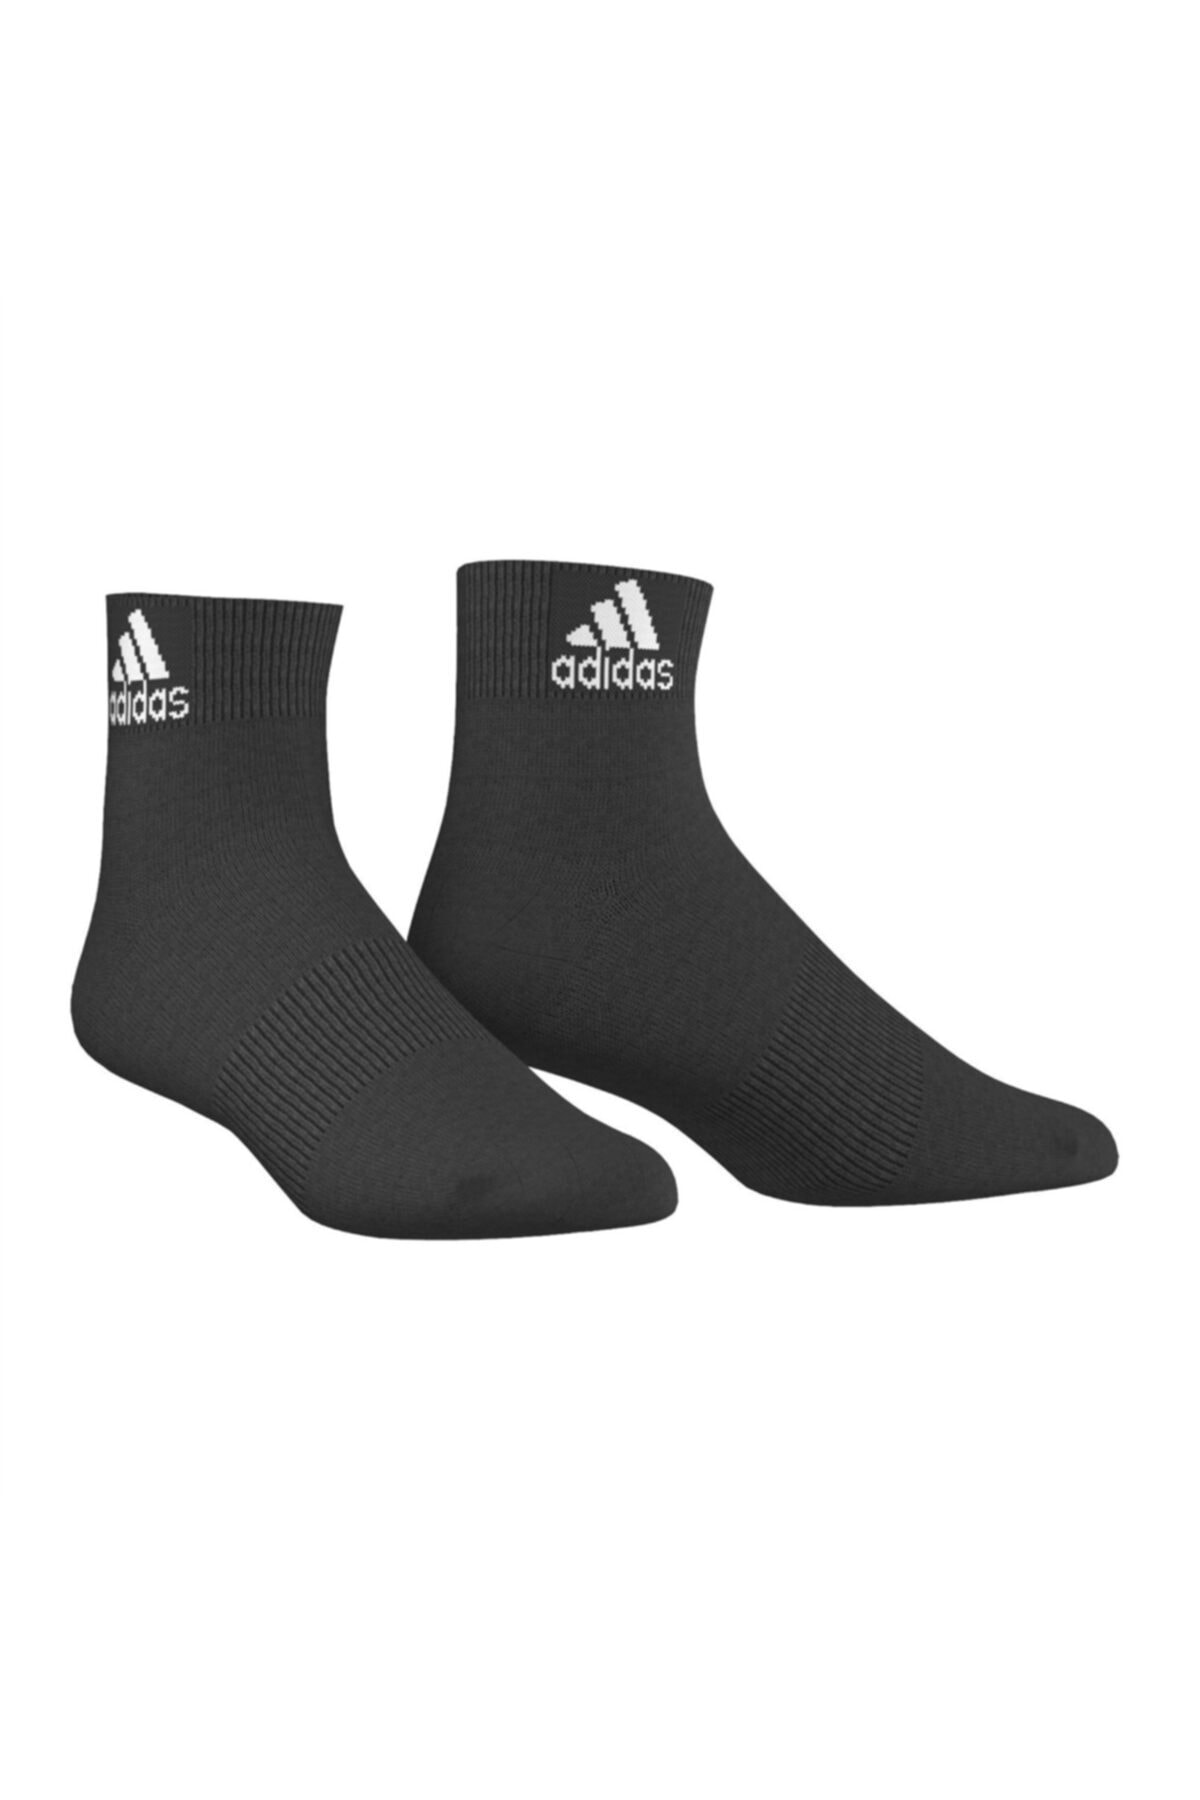 adidas Unisex Siyah Spor Kısa Çorap (aa2324) 1